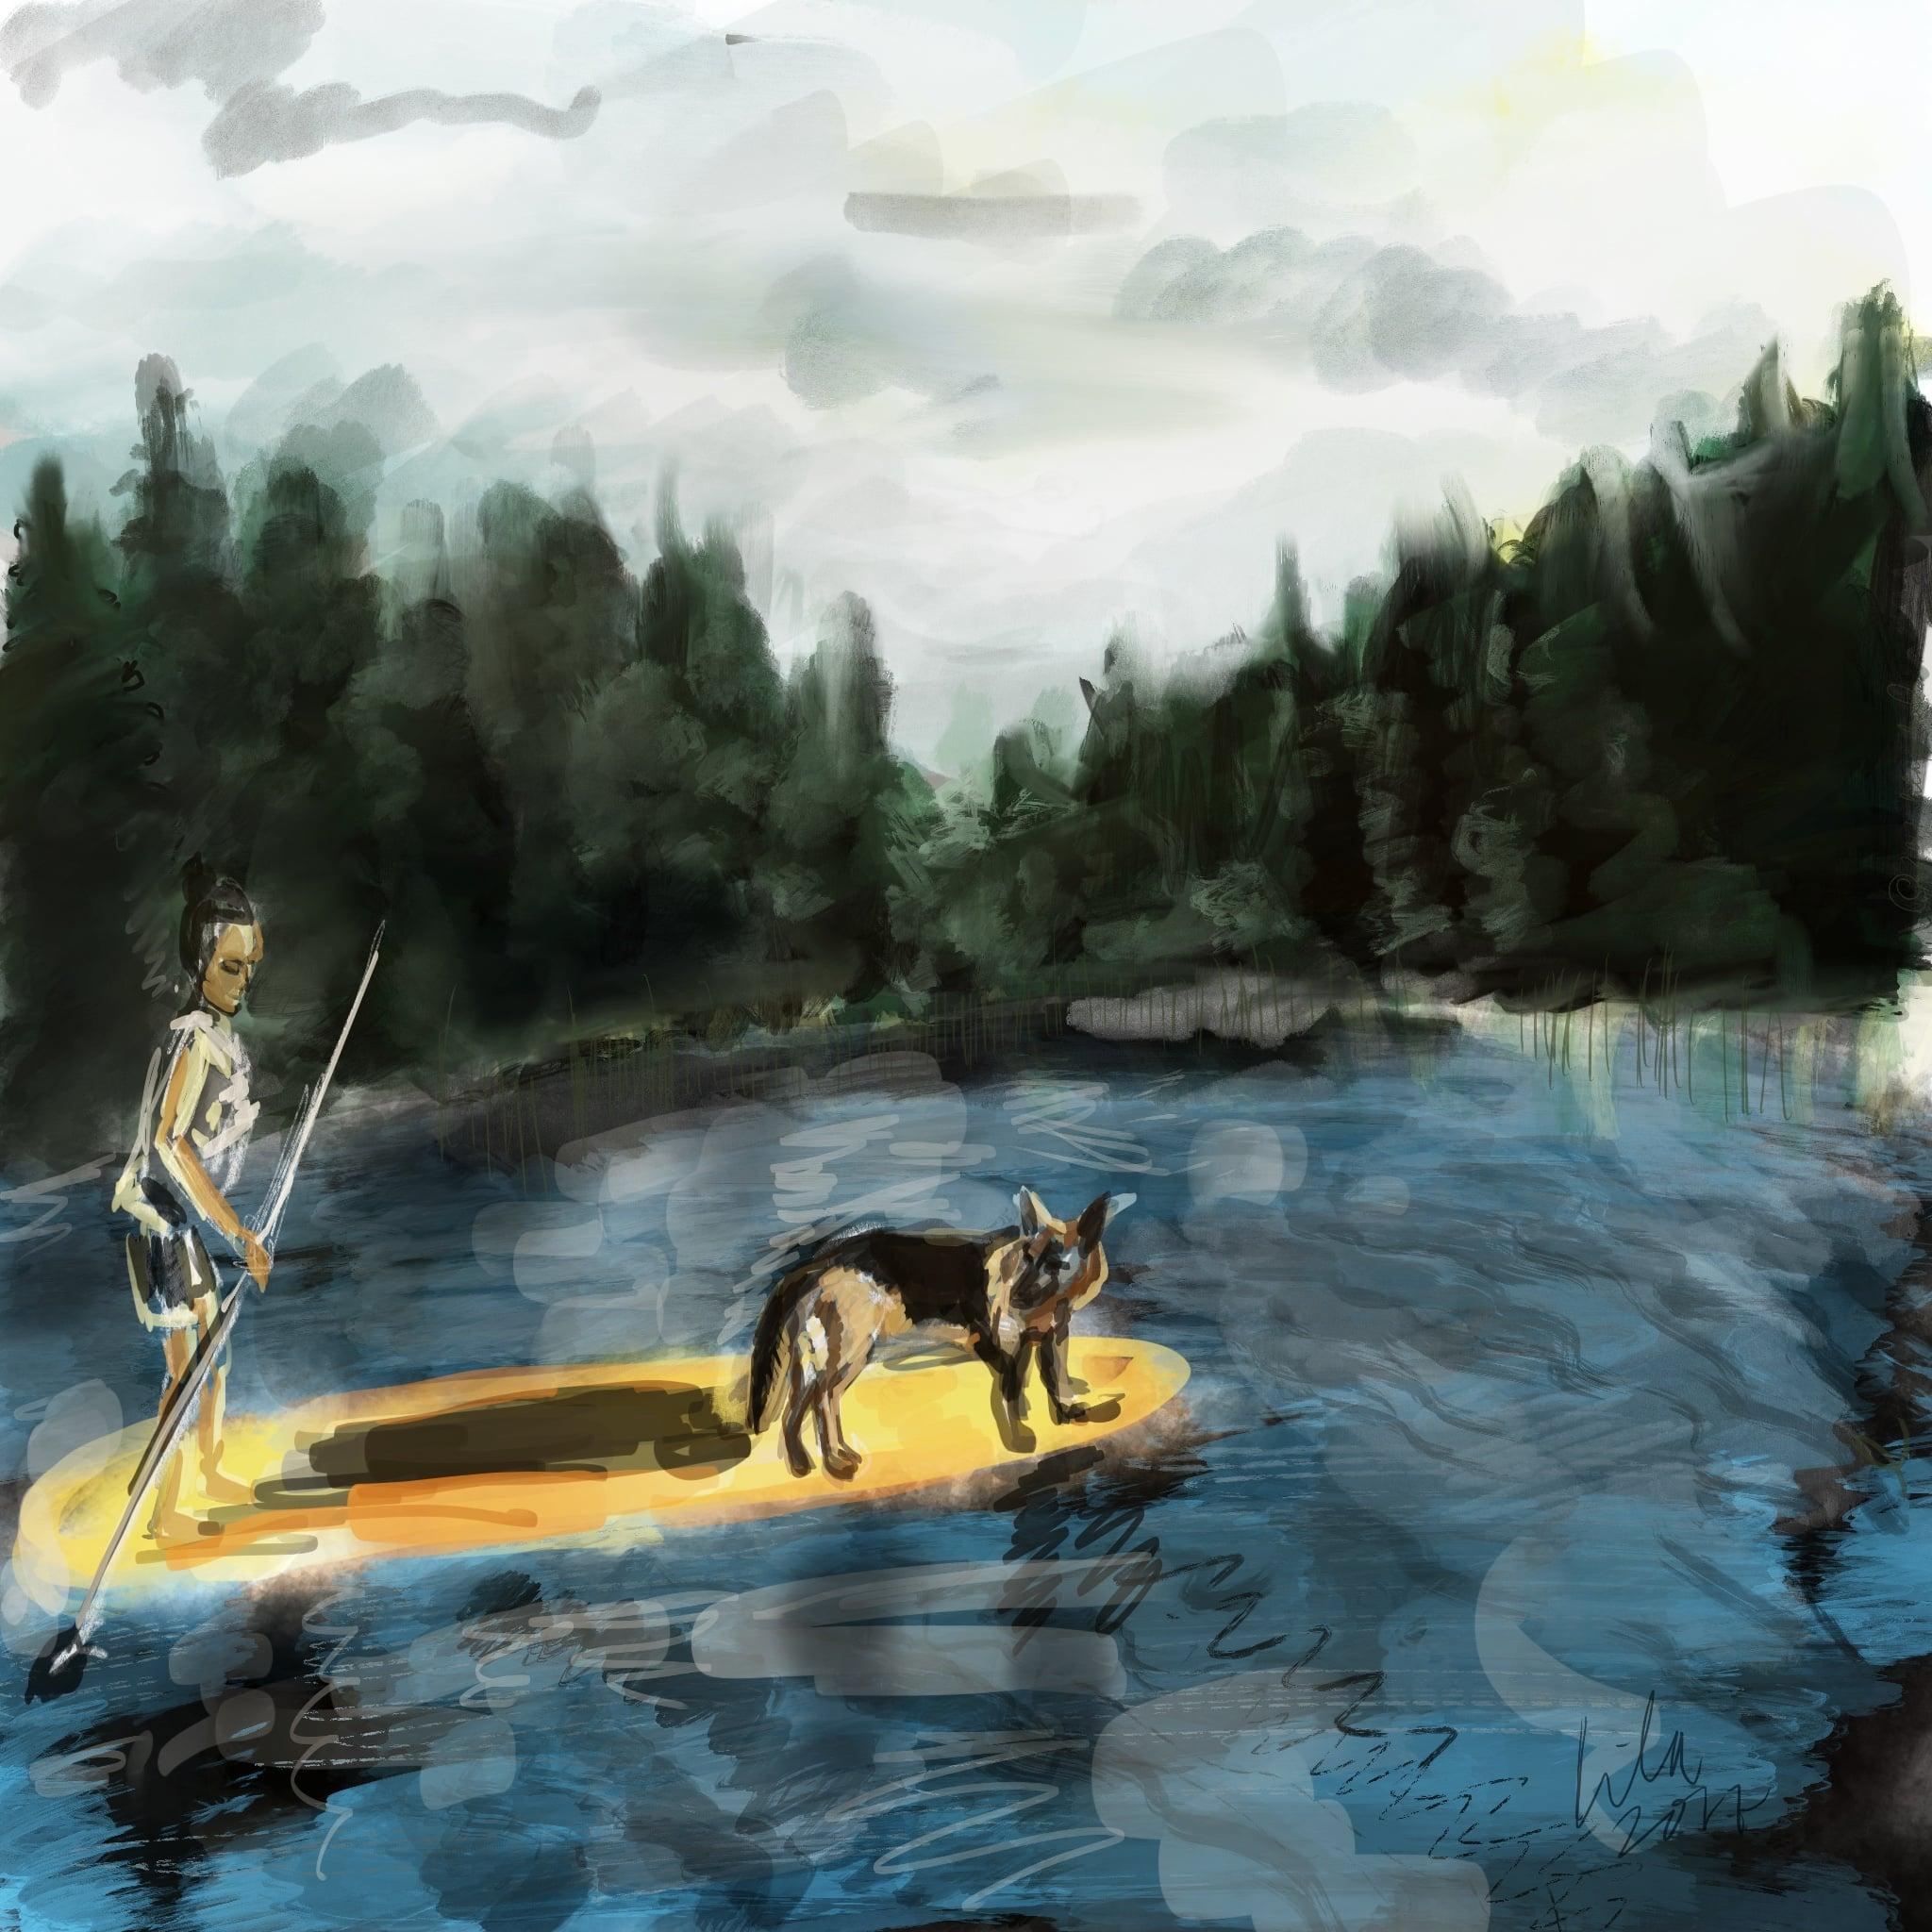 terry-beemer-paddleboard-nomi.jpg